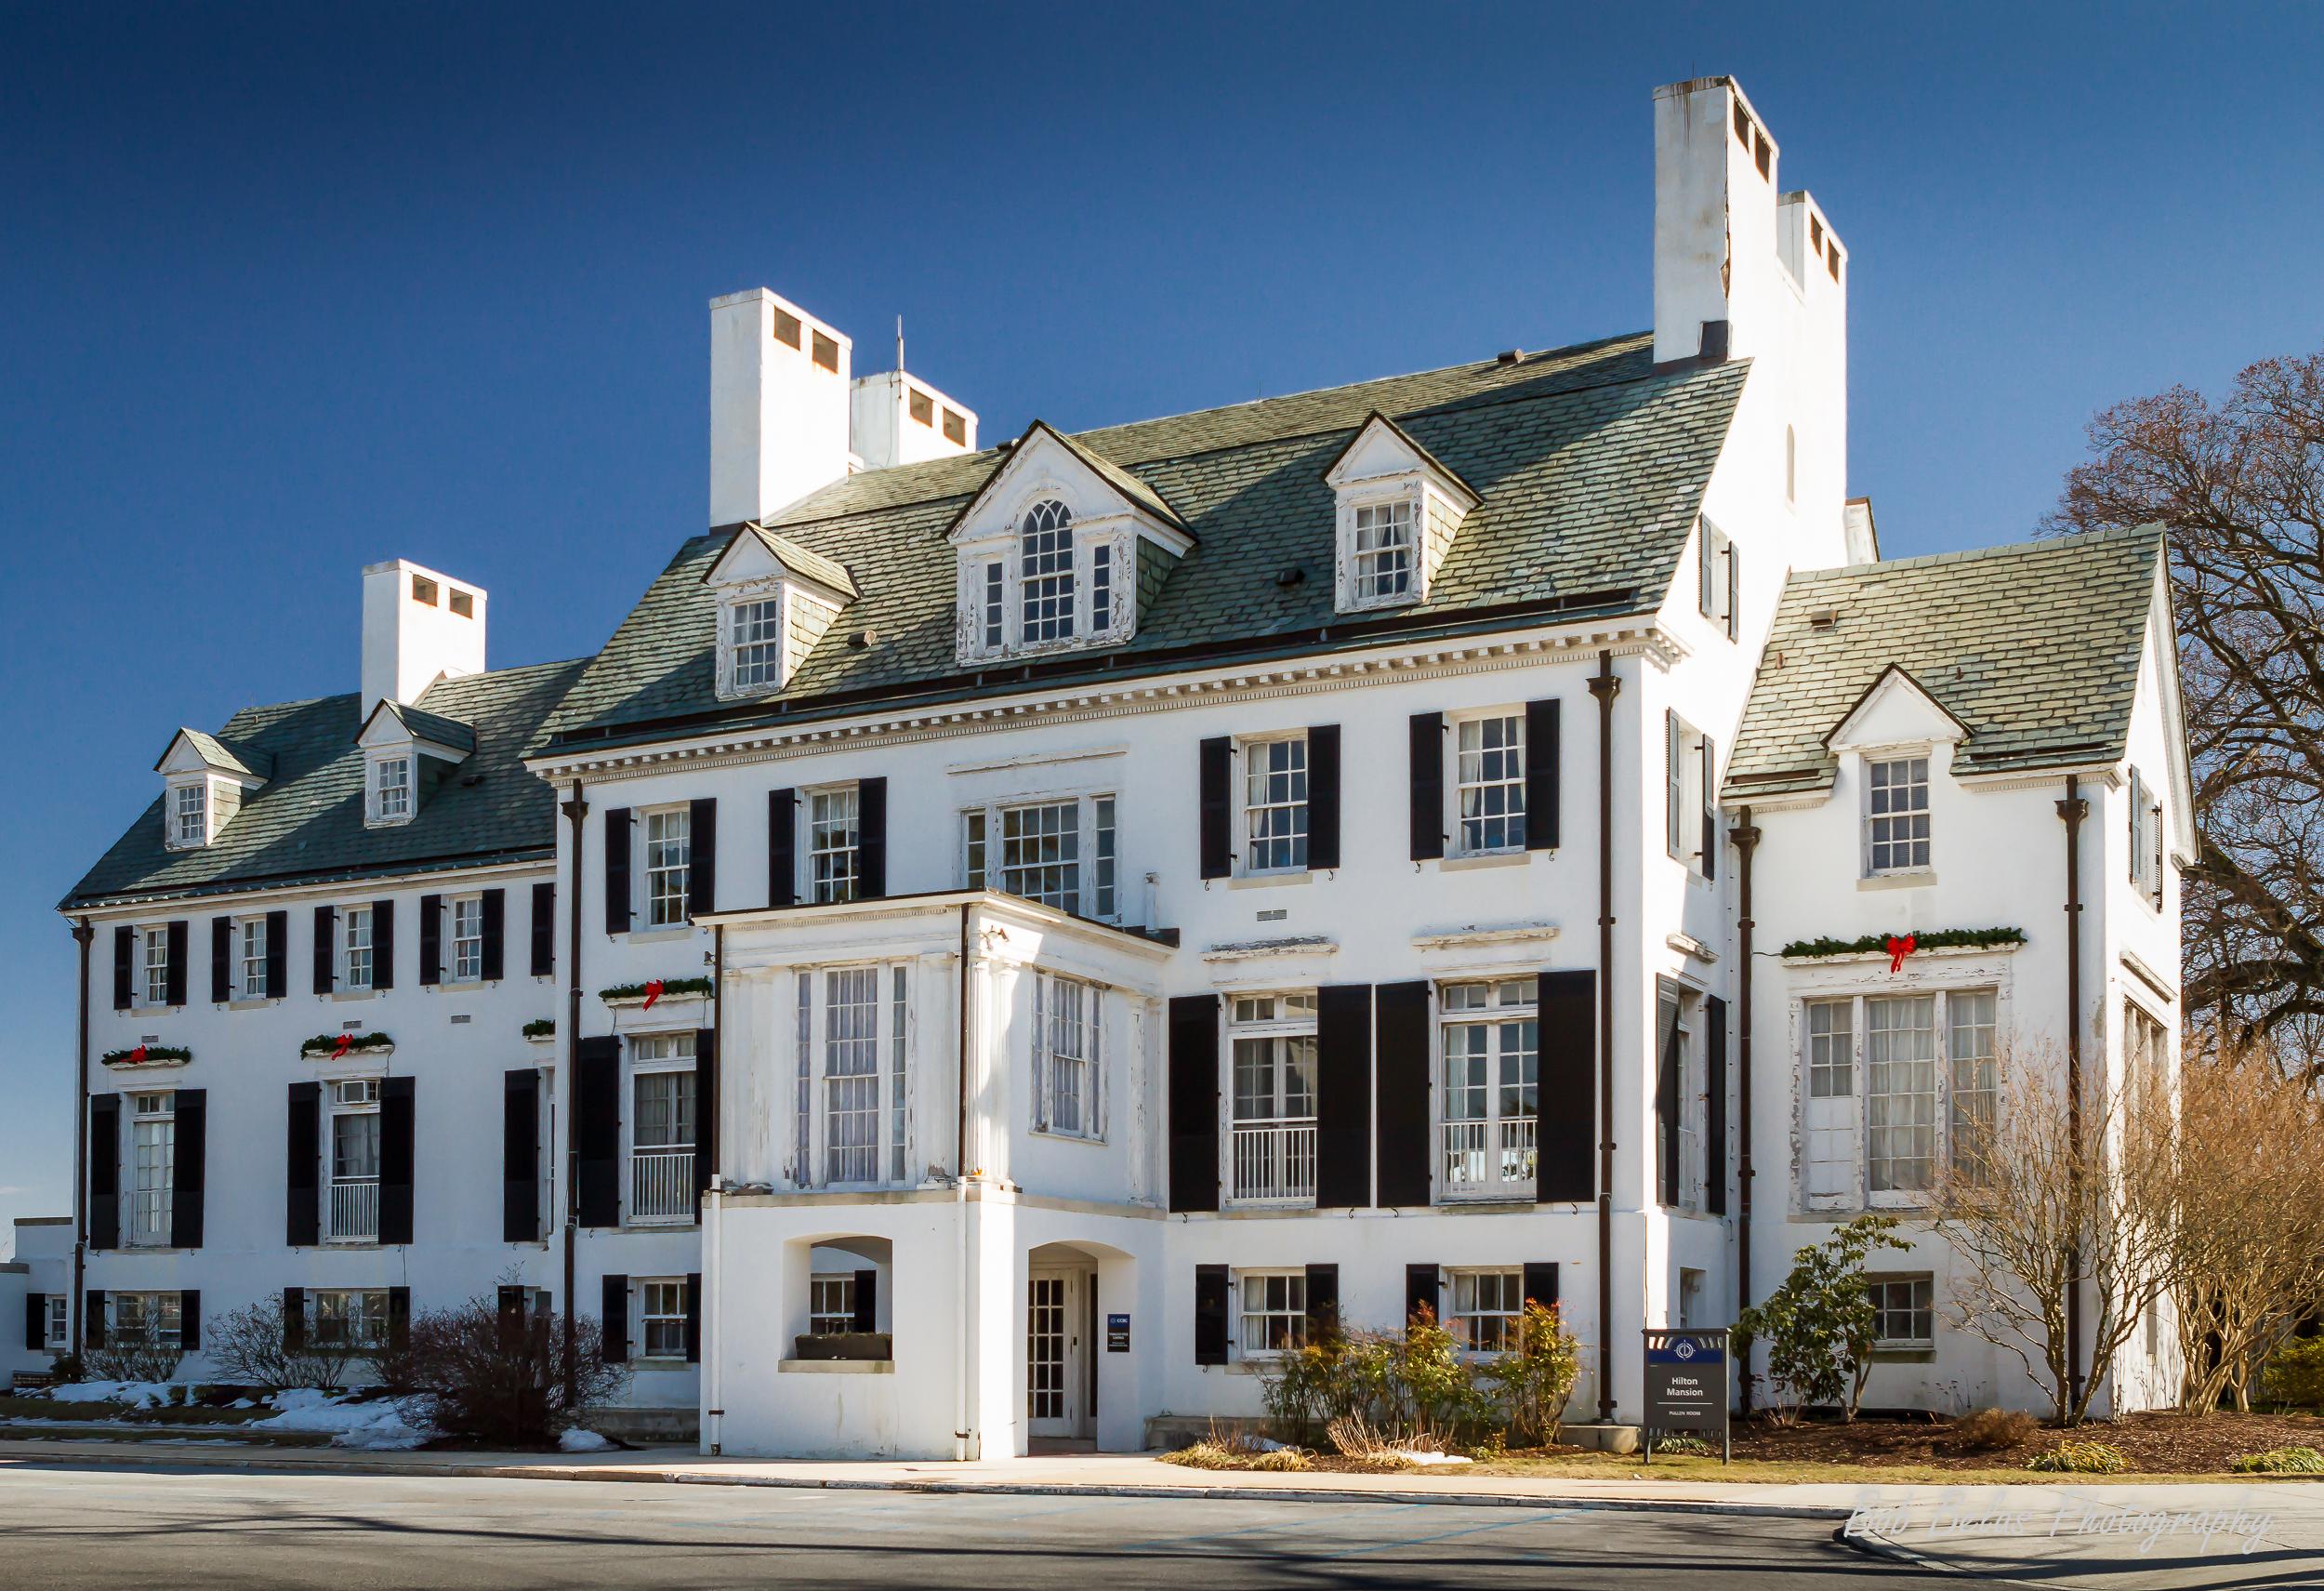 Hilton Mansion